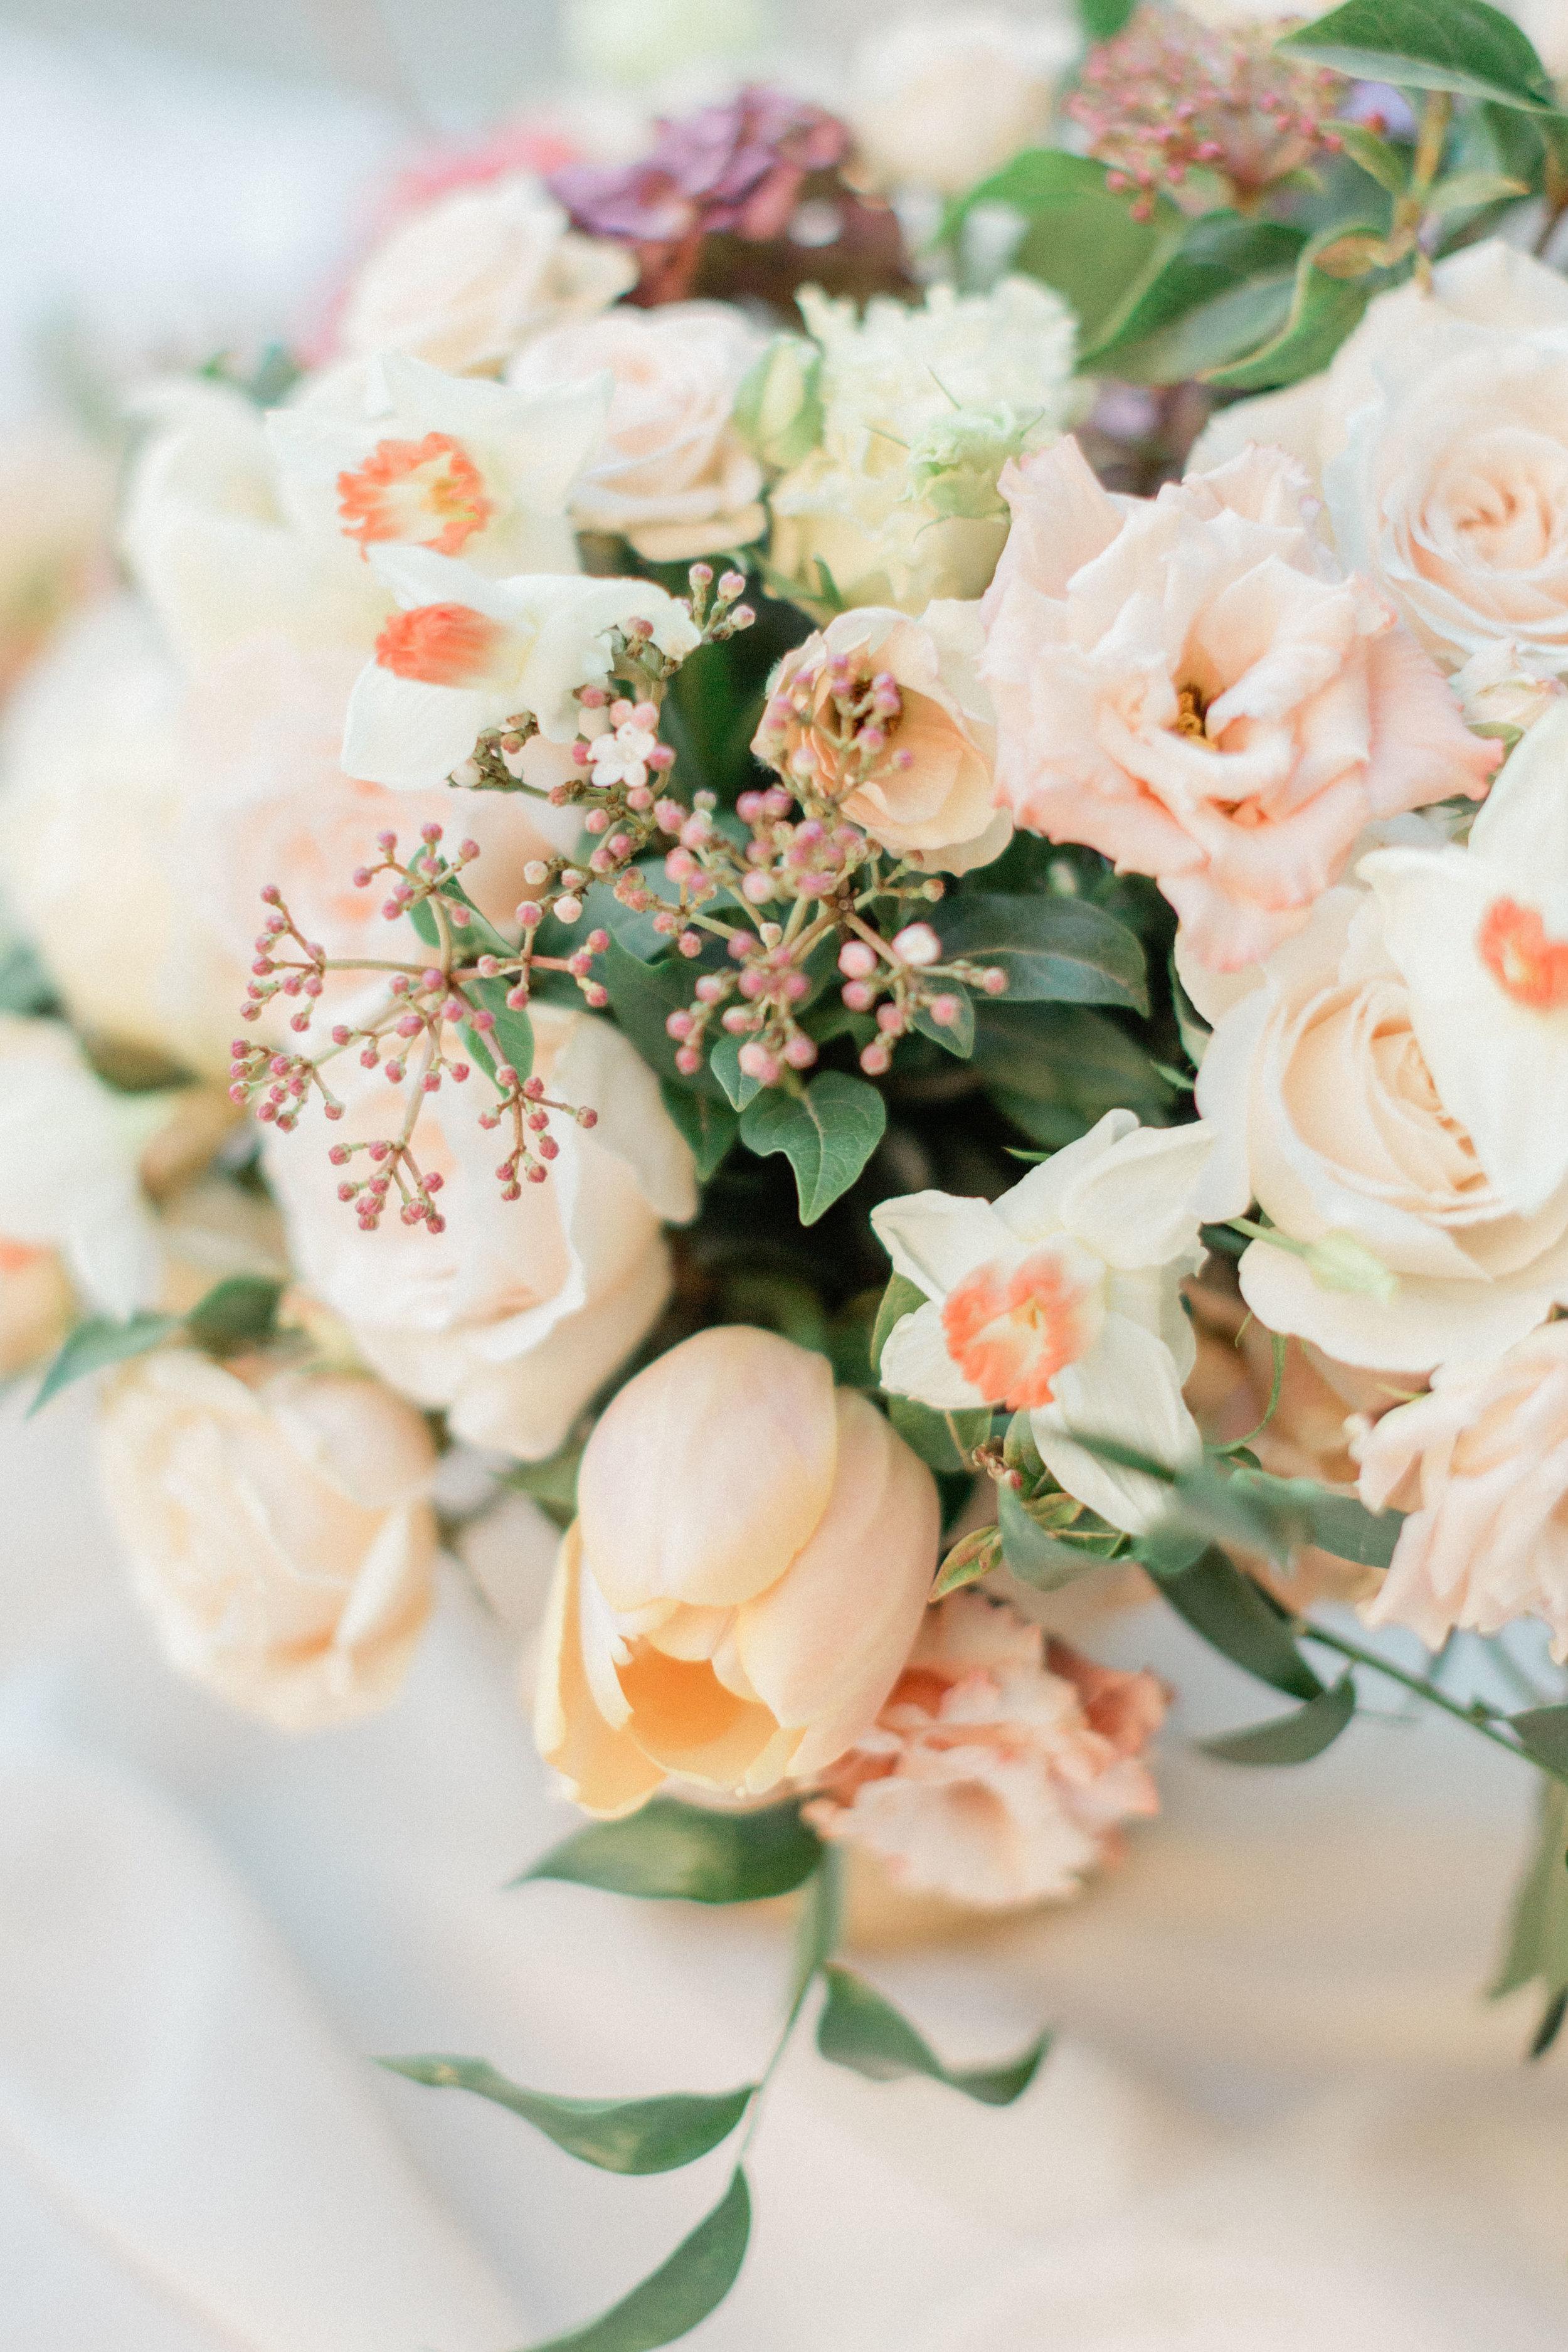 Garden_Style_Lush_Florals_Closeup_Sibyl_Sophia_Des_Moines_Iowa.jpg